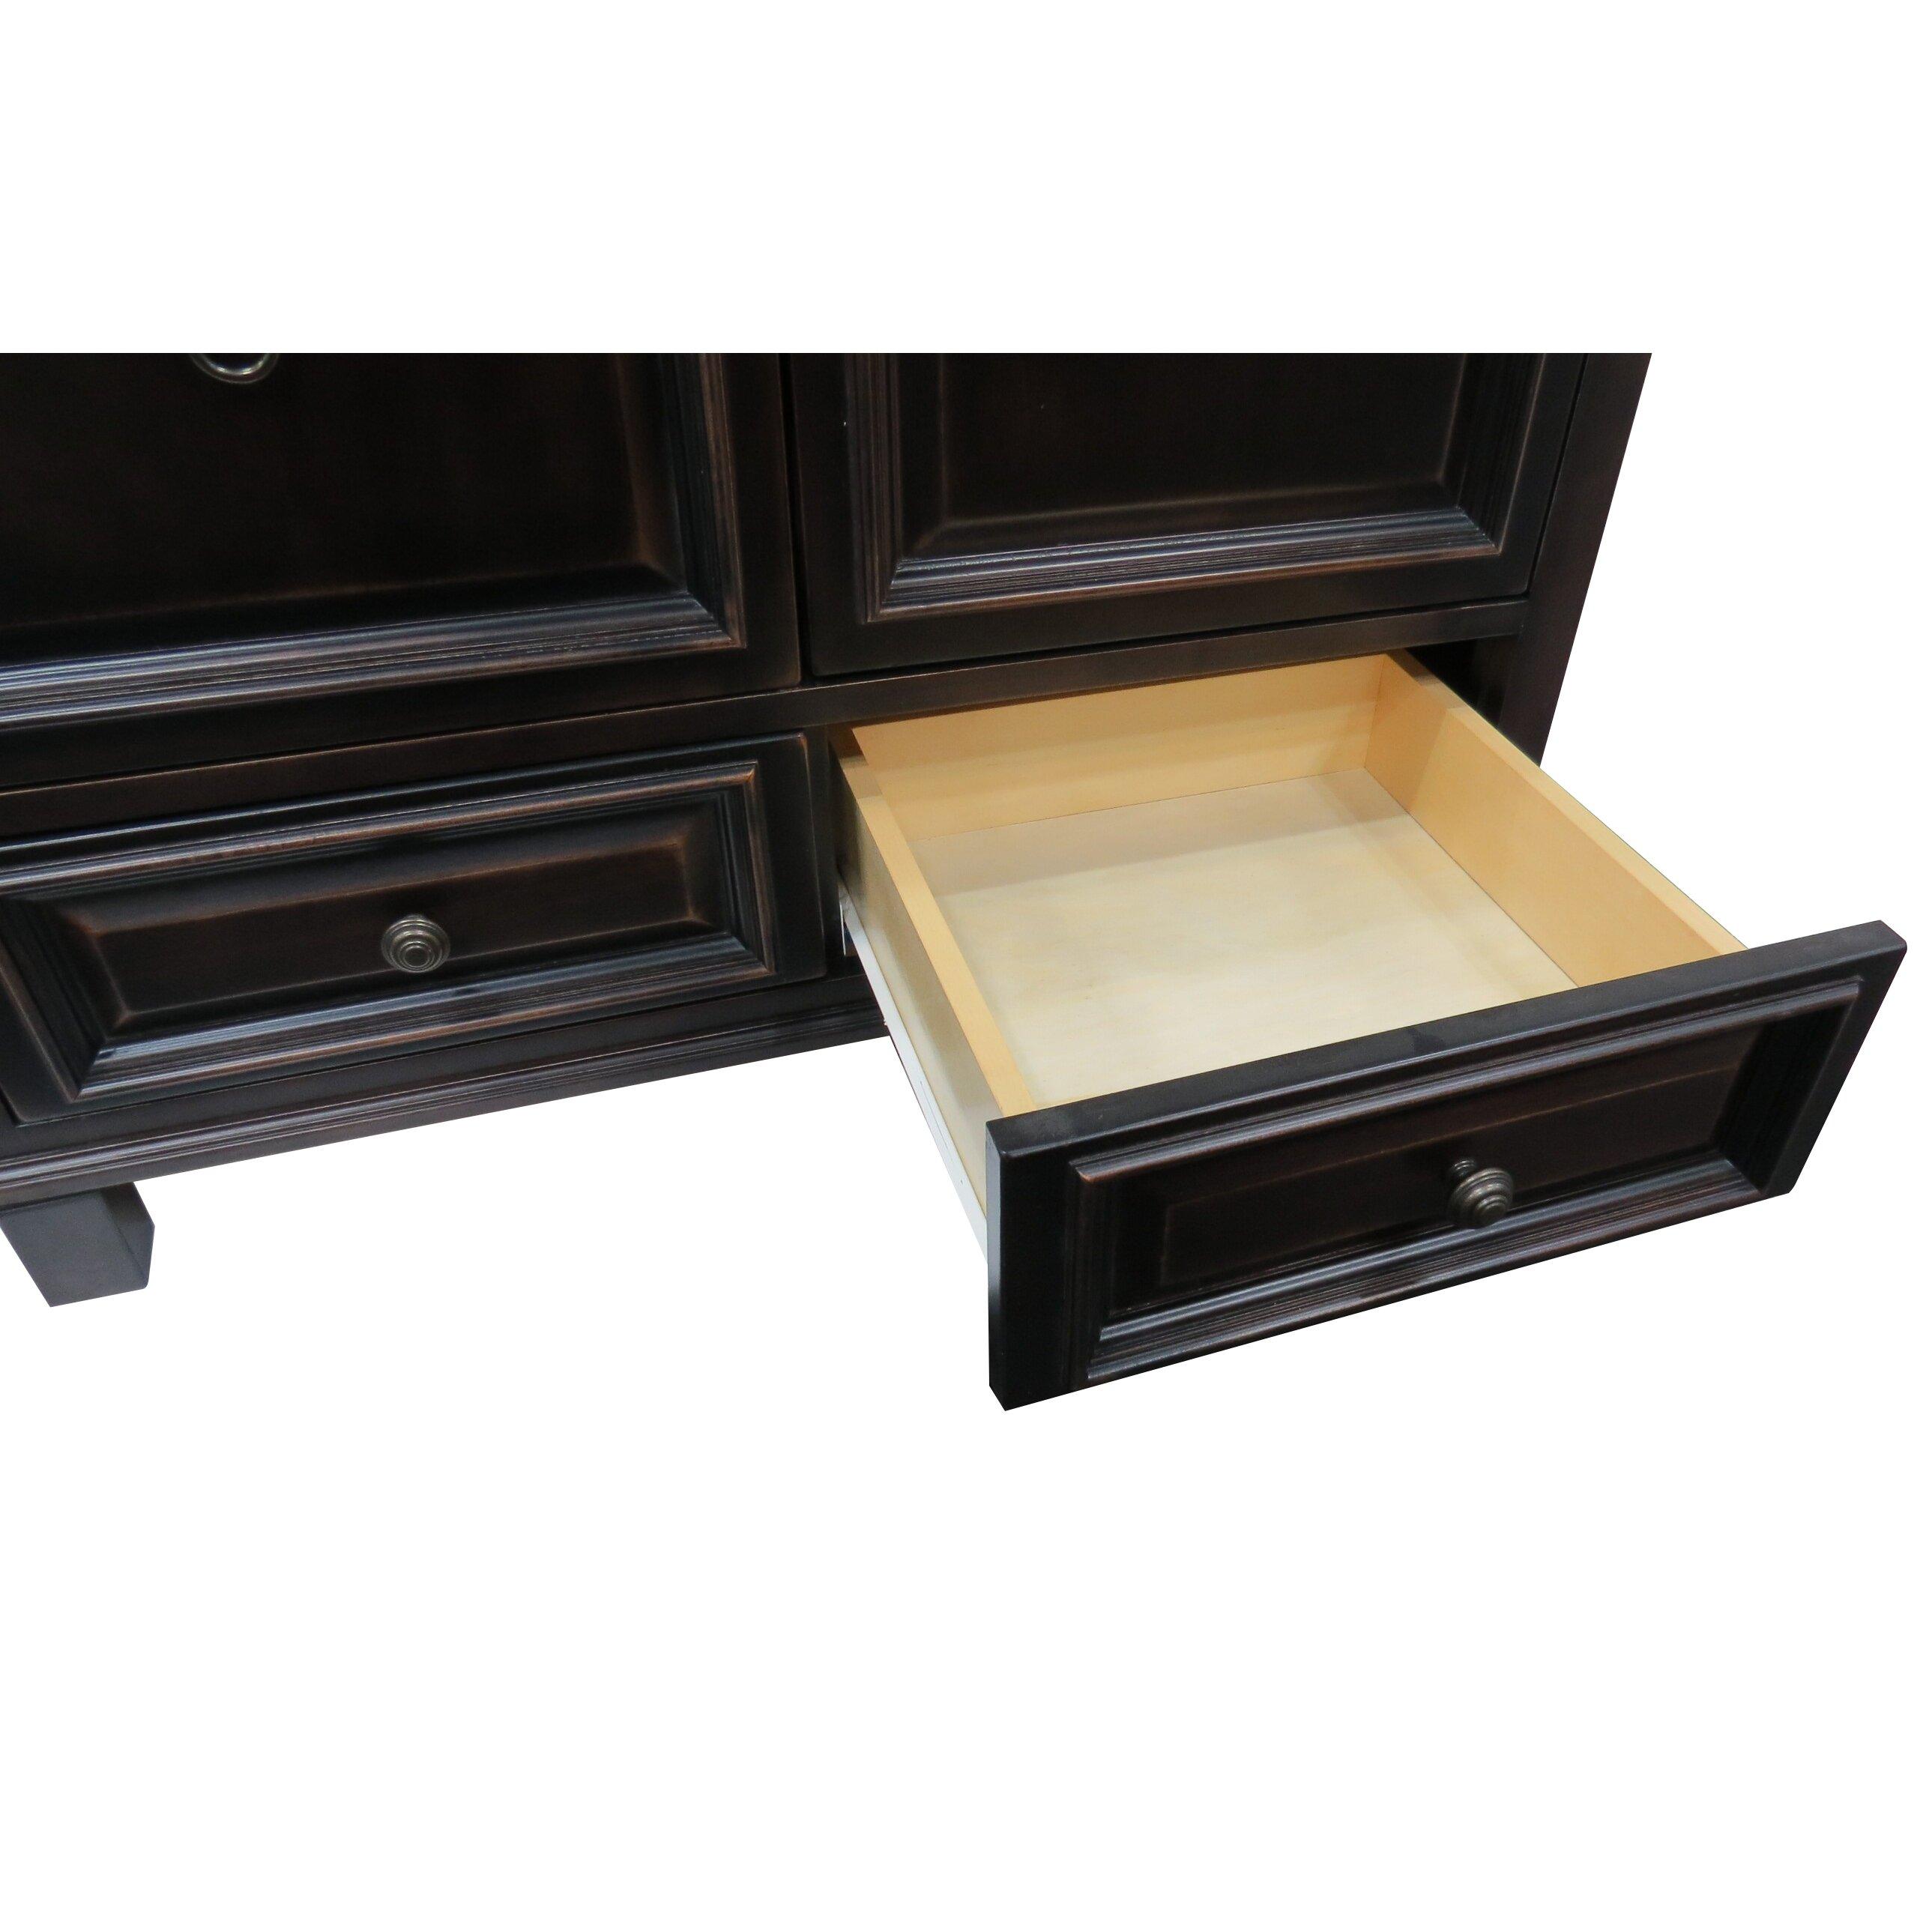 Sunnywood Kitchen Cabinets Sunny Wood Barton Hill 36 Bathroom Vanity Base Reviews Wayfair